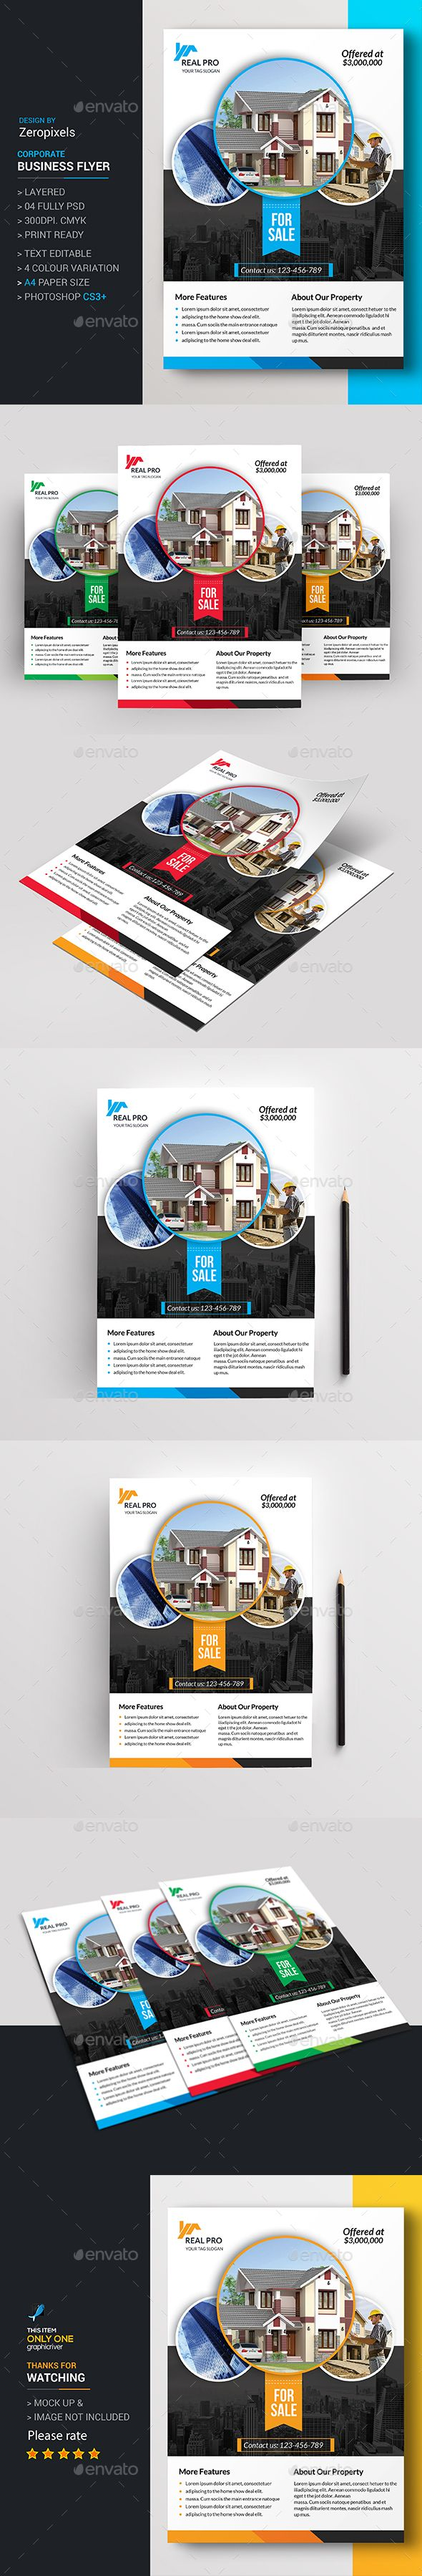 Real Estate Flyer Template PSD. Download here: http://graphicriver.net/item/real-estate-flyer/15996966?ref=ksioks